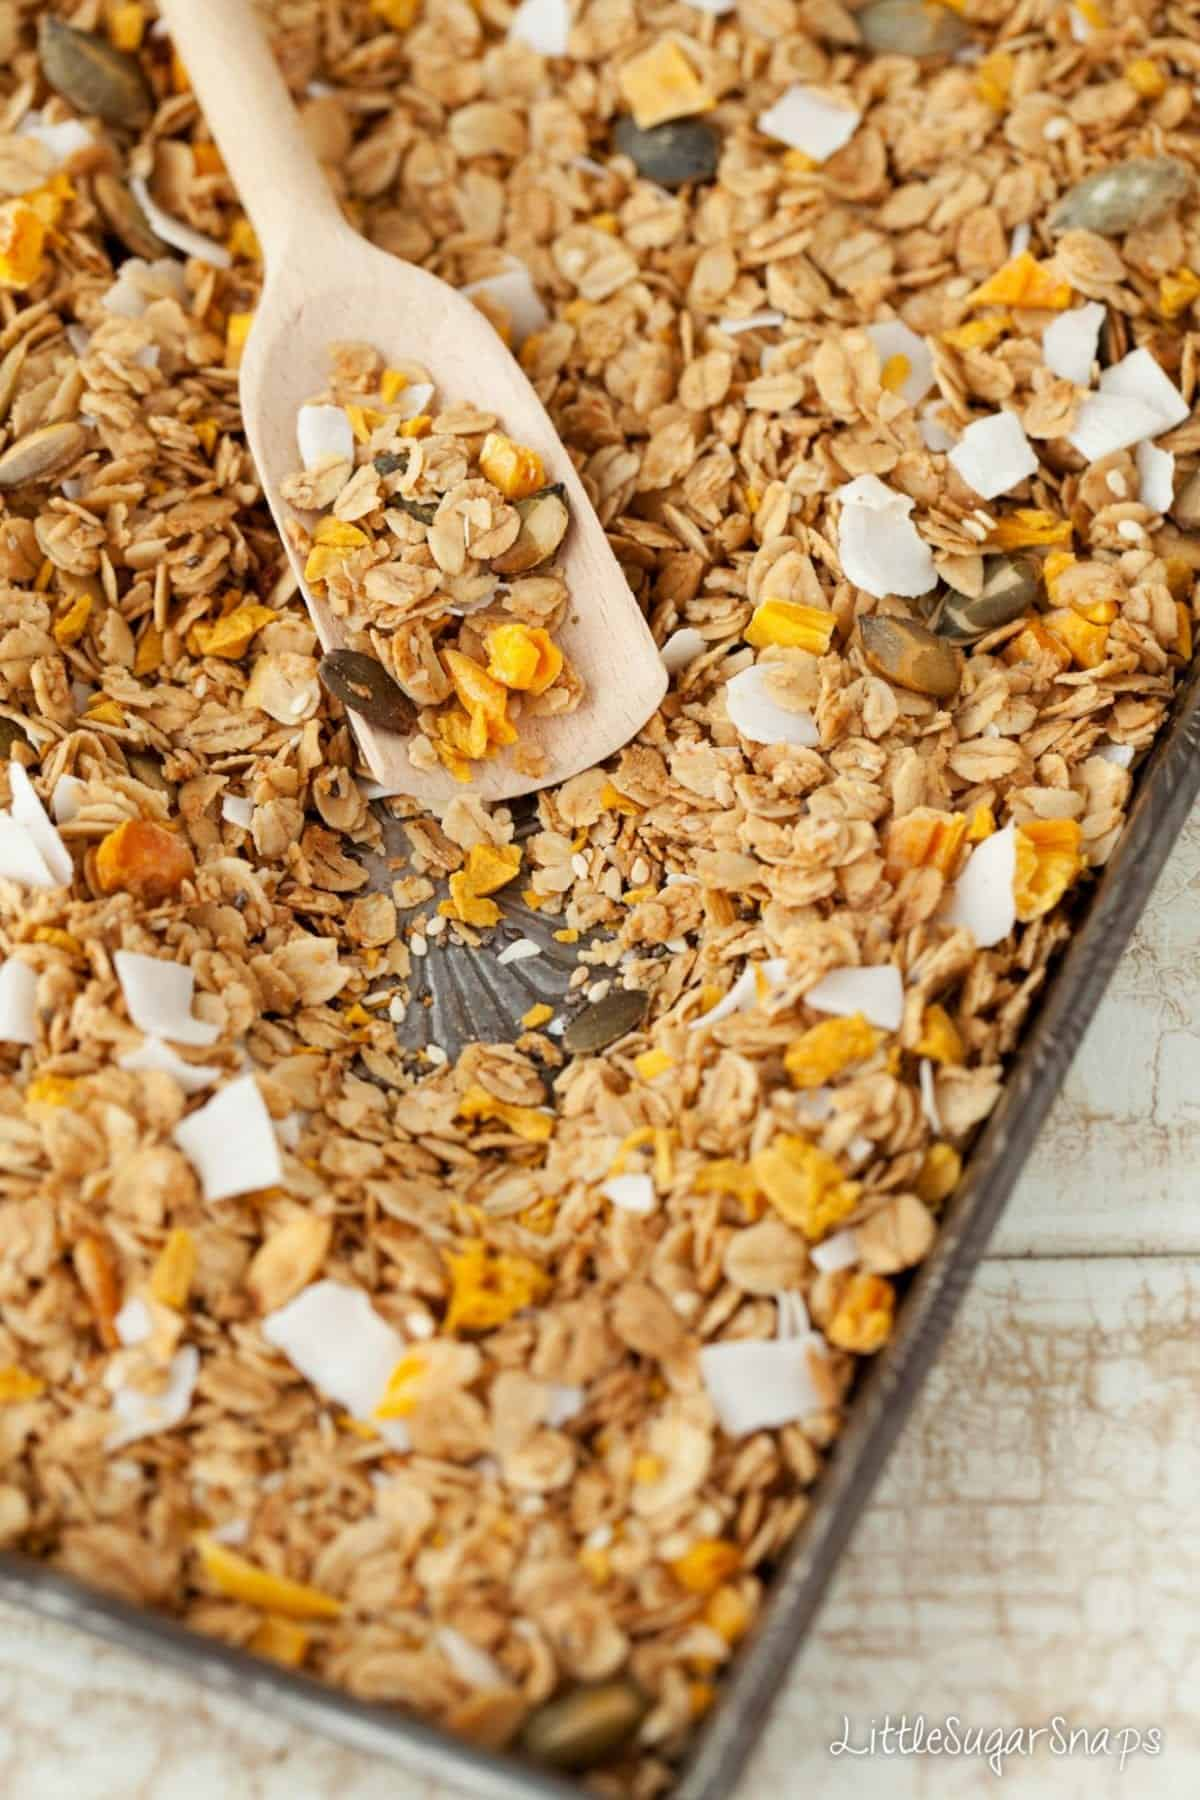 freshly baked granola on a baking tin